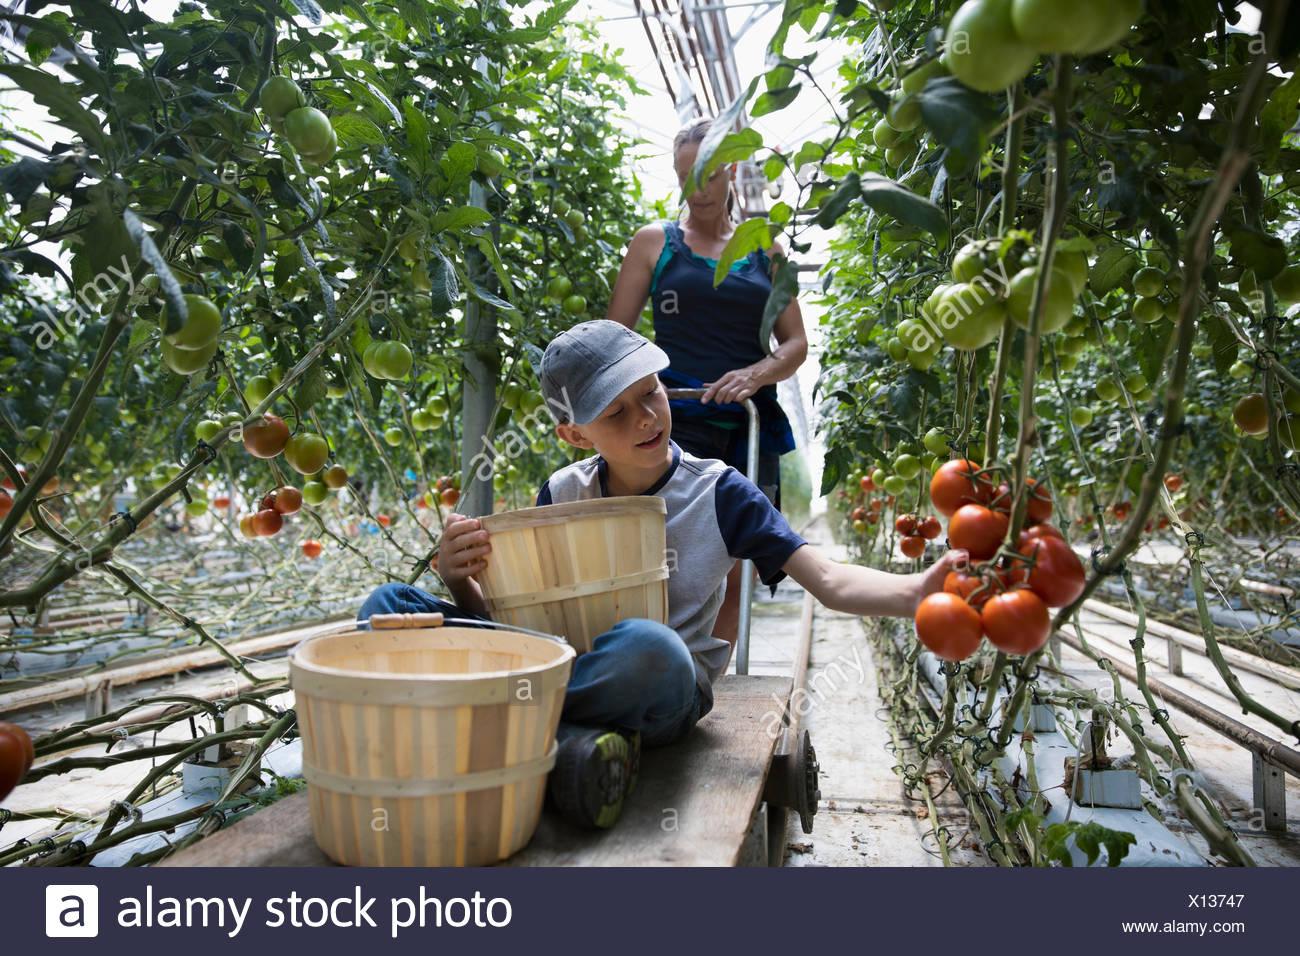 Garçon avec boisseaux harvesting tomatoes growing on plant de tomate en serre Photo Stock